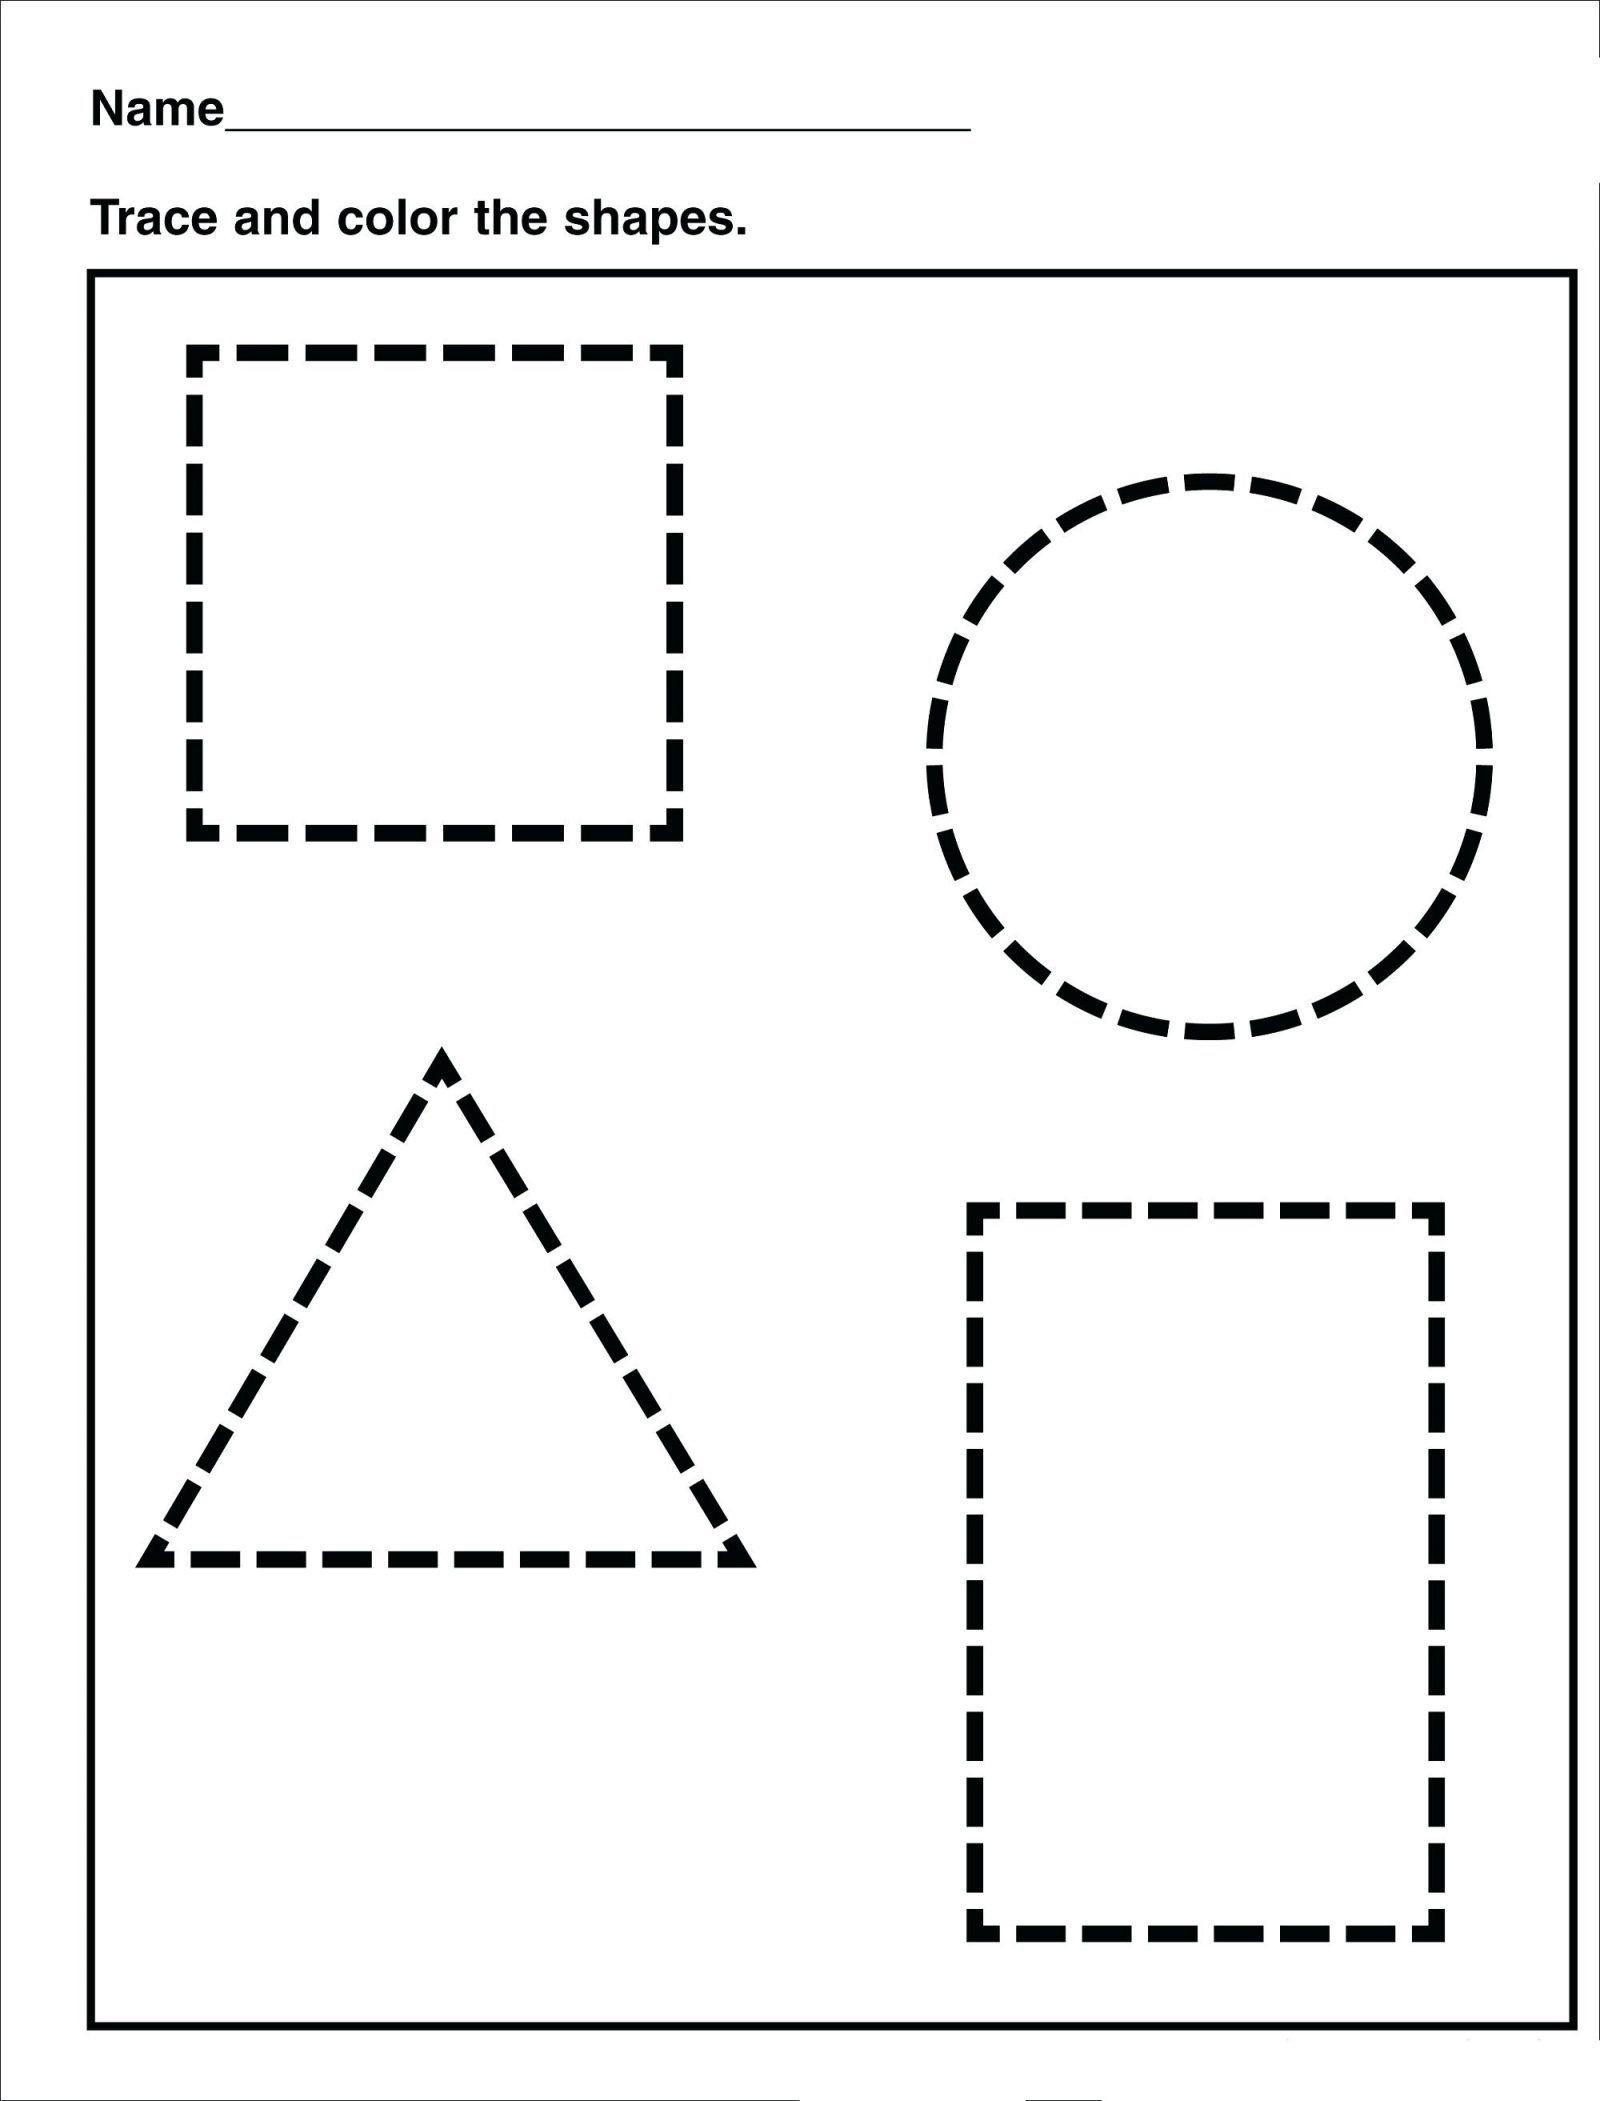 Tracing   Shape Tracing   Preschool / Free Printable Worksheets - Free Printable Activities For Preschoolers